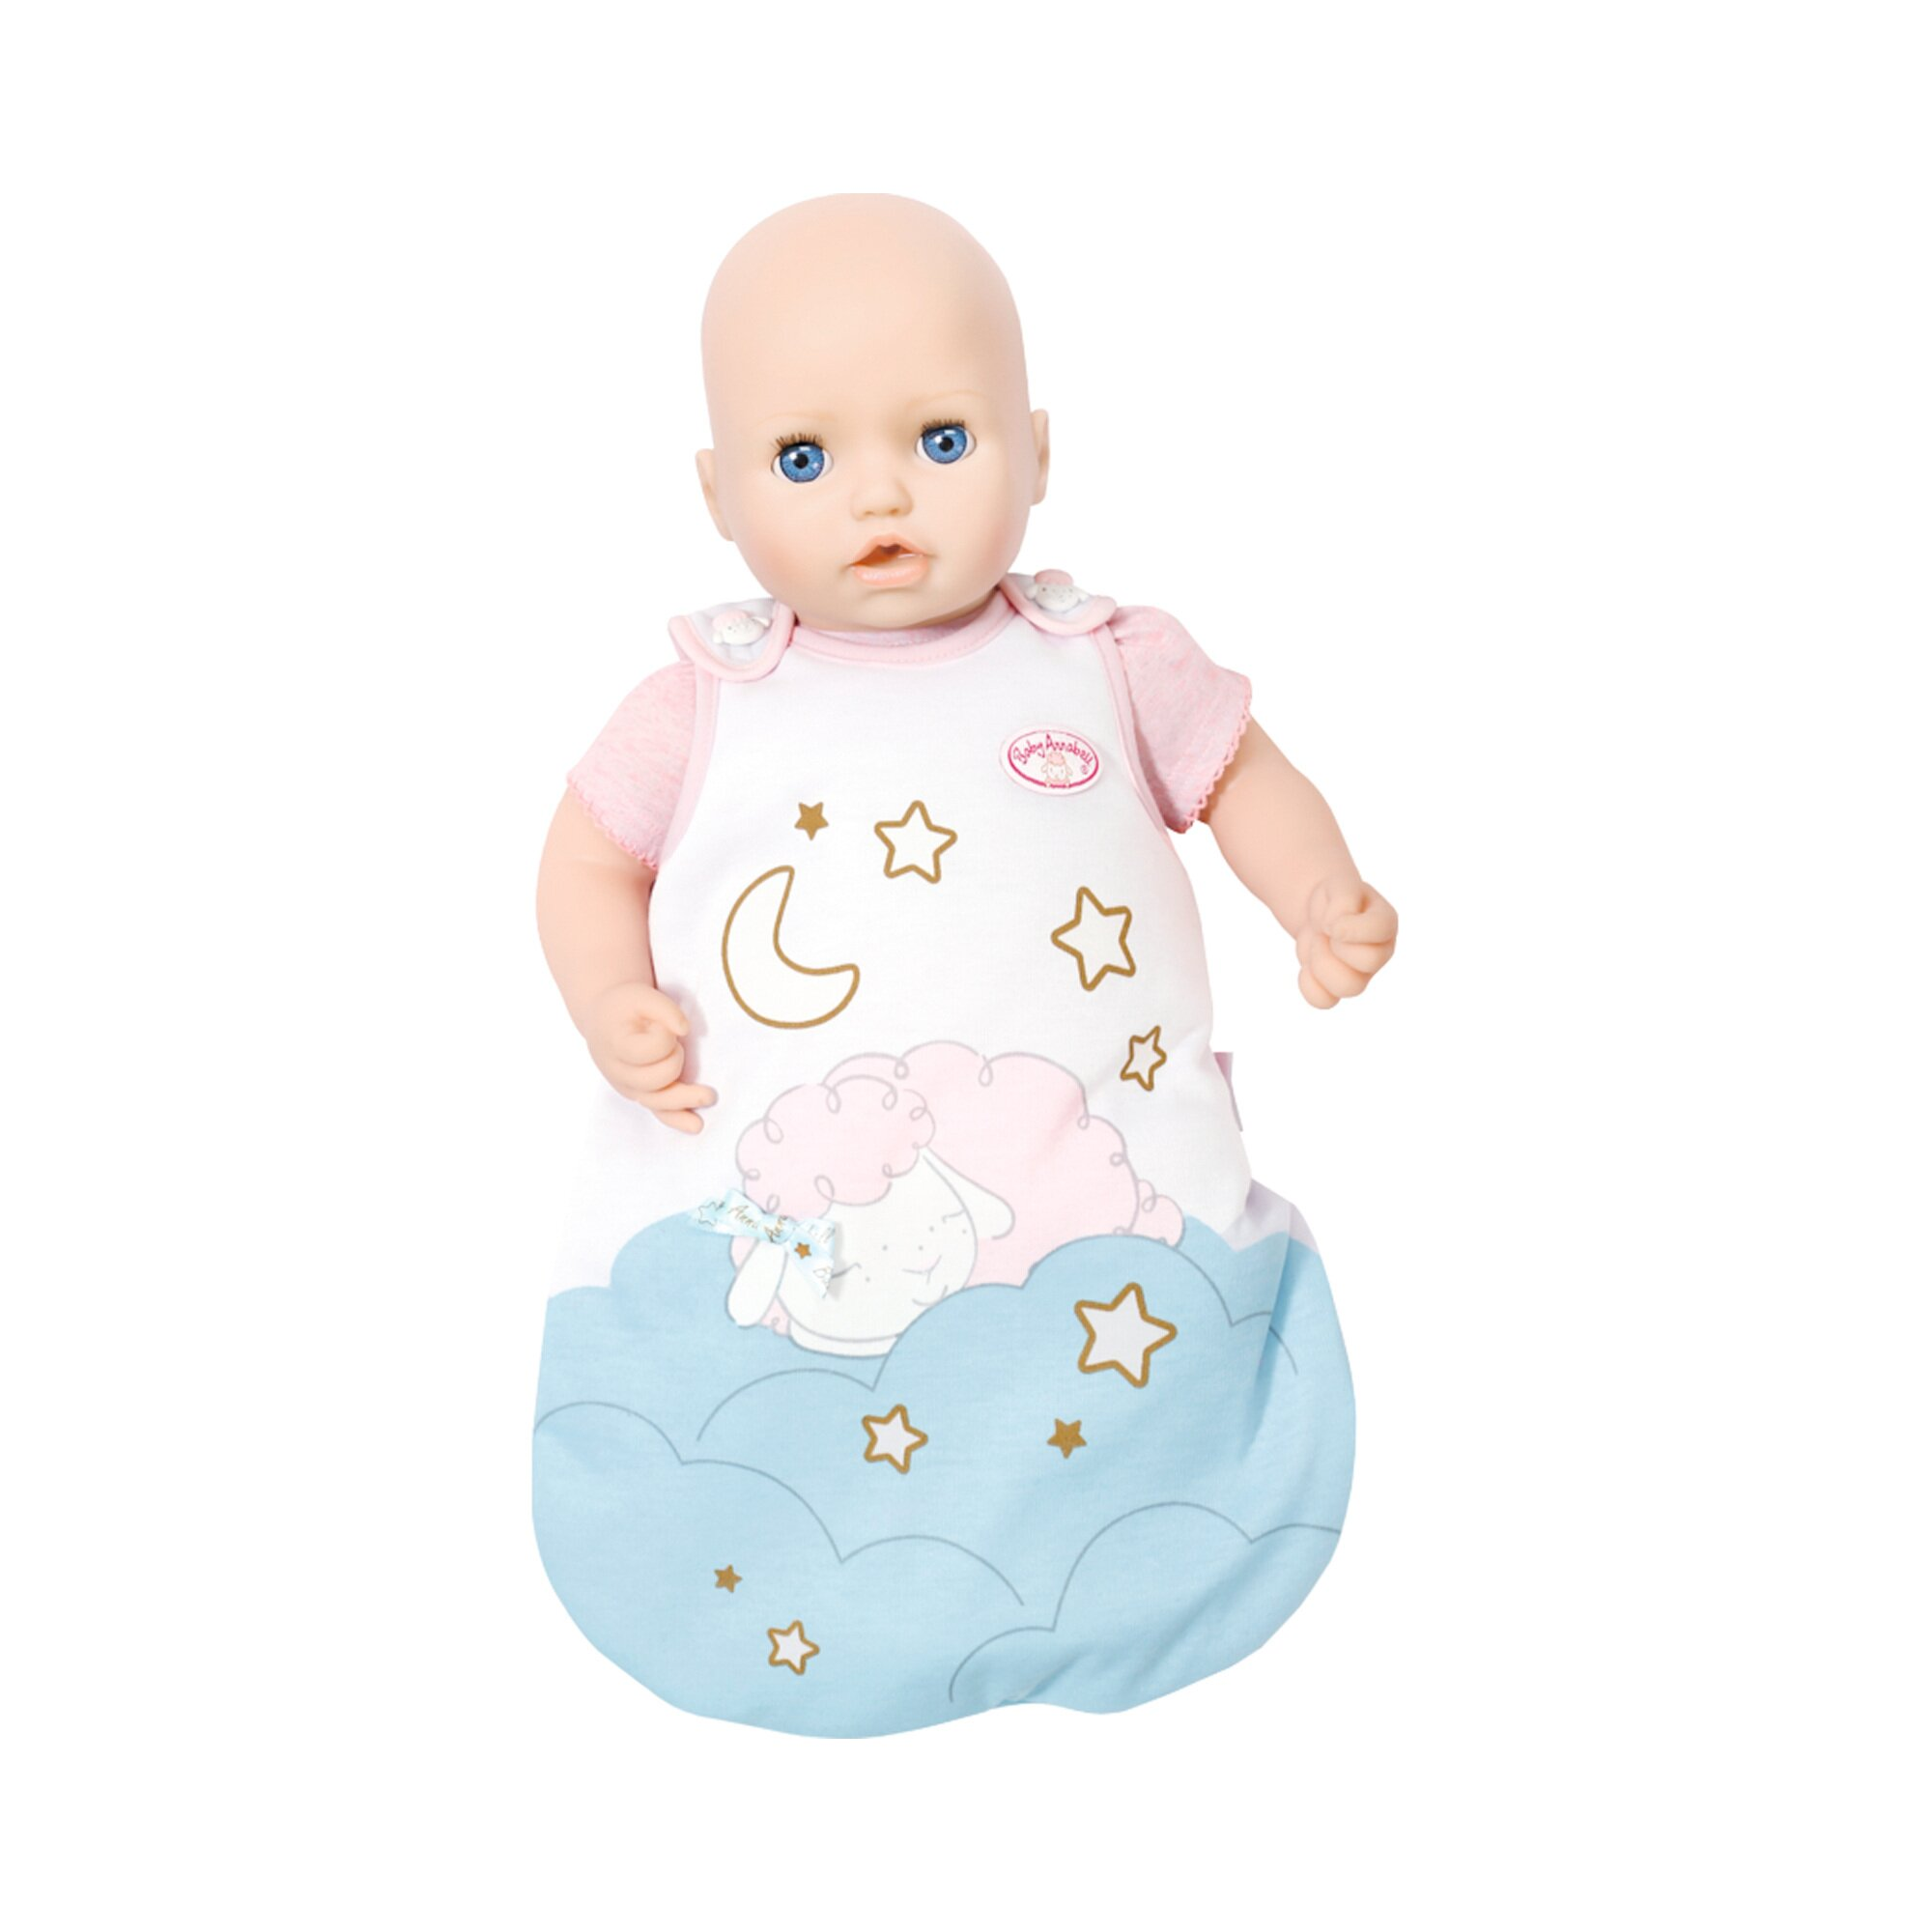 baby-annabell-puppen-schlafsack-sweet-dreams